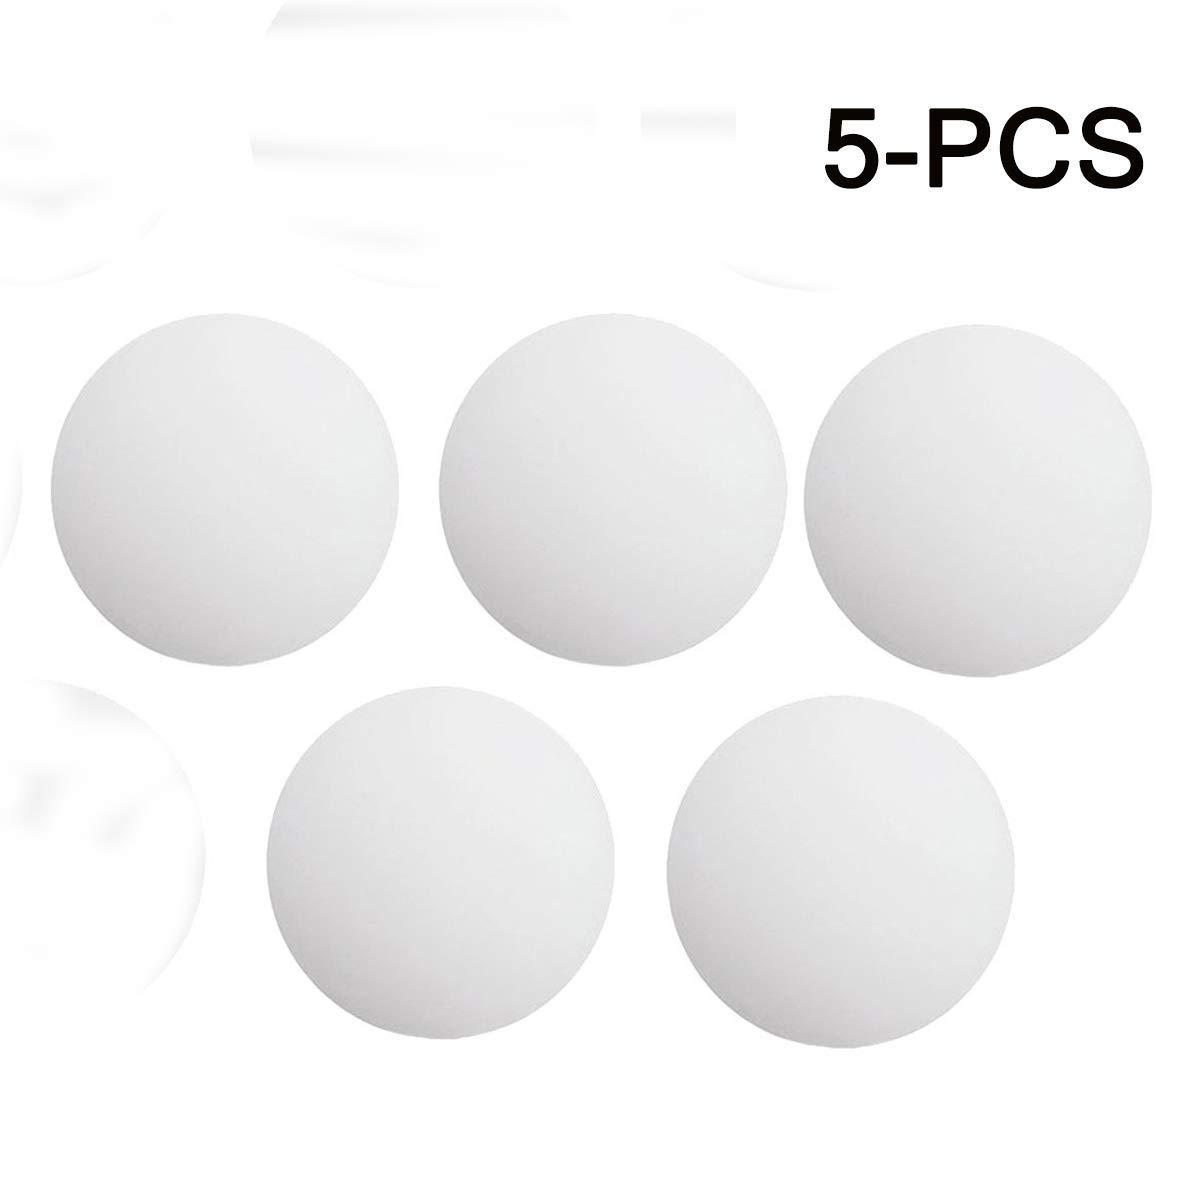 Xelparuc 5Pcs Silicone Door Stopper Wall Protectors, Self Adhesive Door Handle Bumper, Guard Stopper Rubber Stop for Door Knob, Kitchen, Office(White)